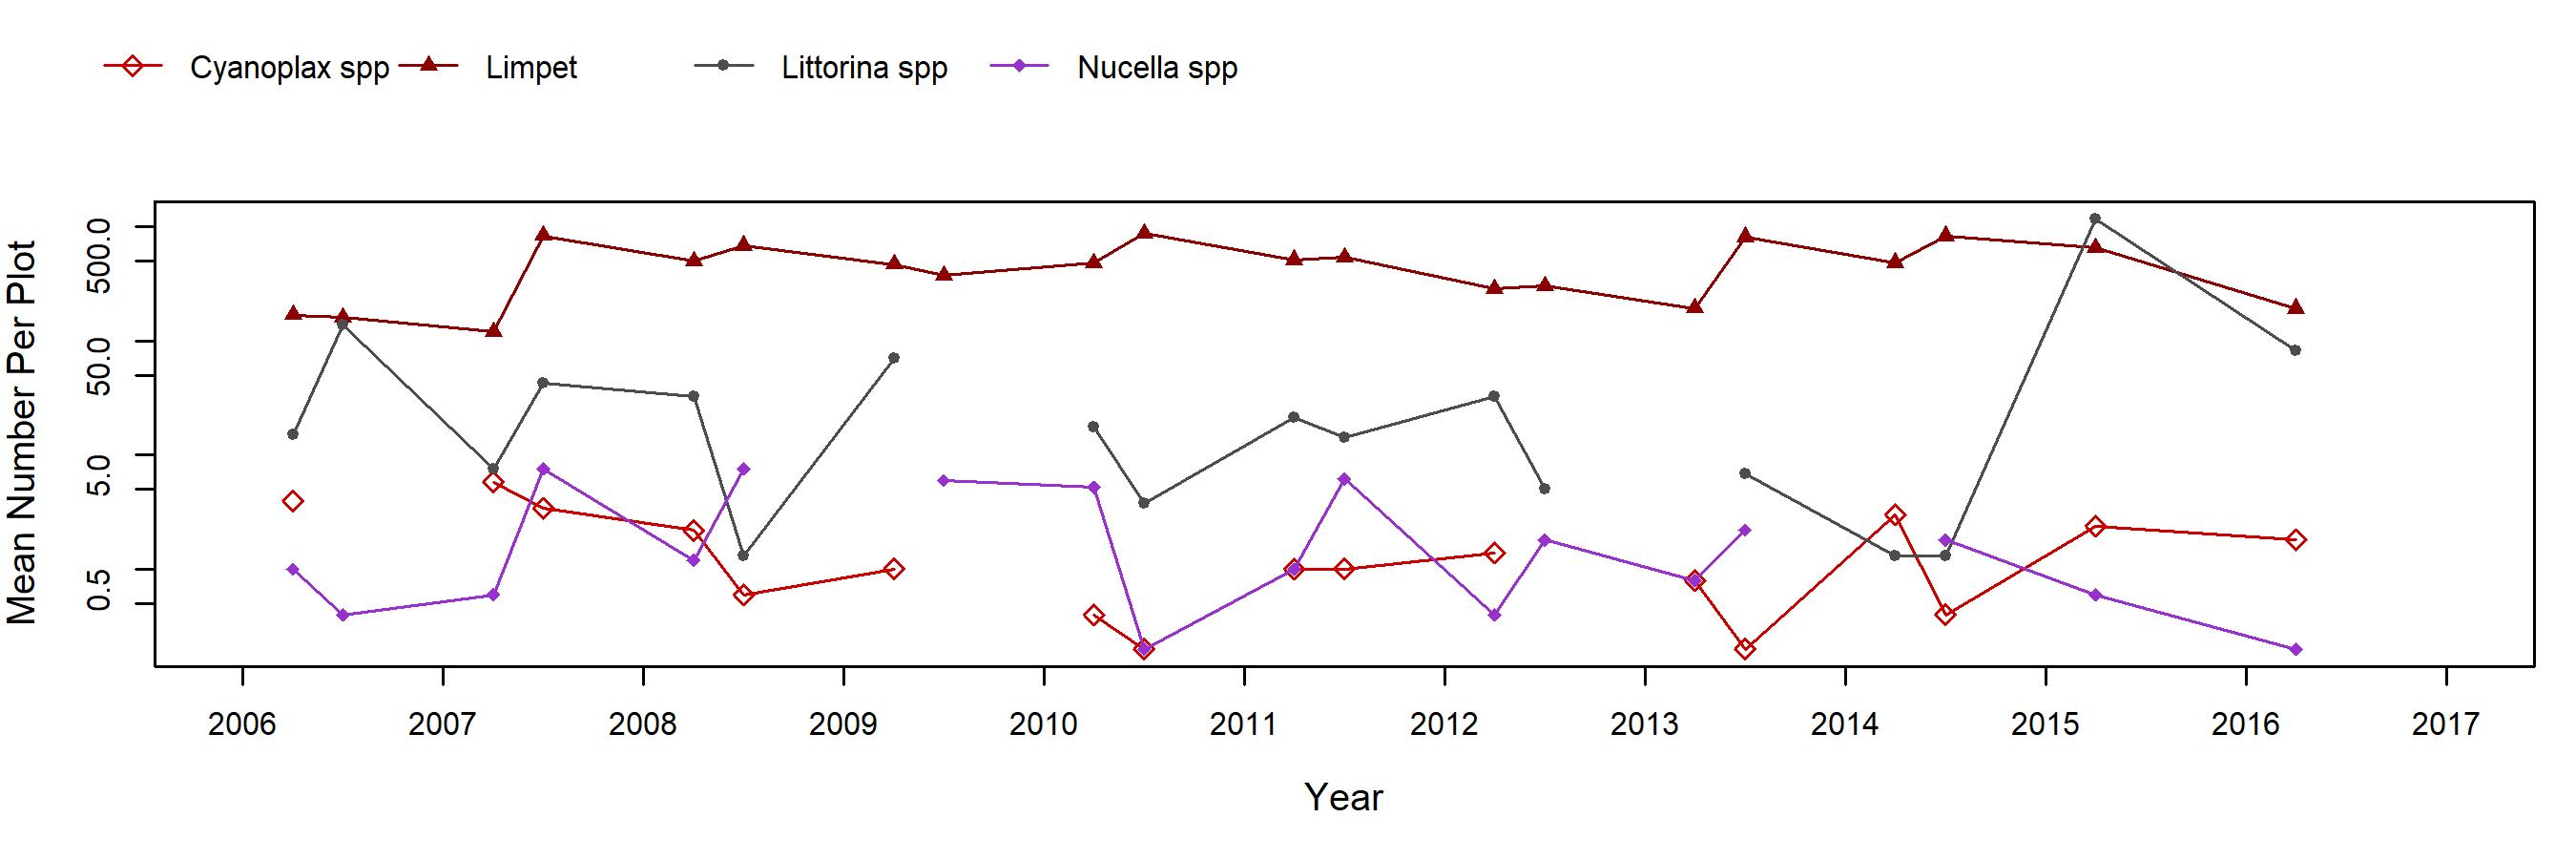 Enderts Endocladia trend plot